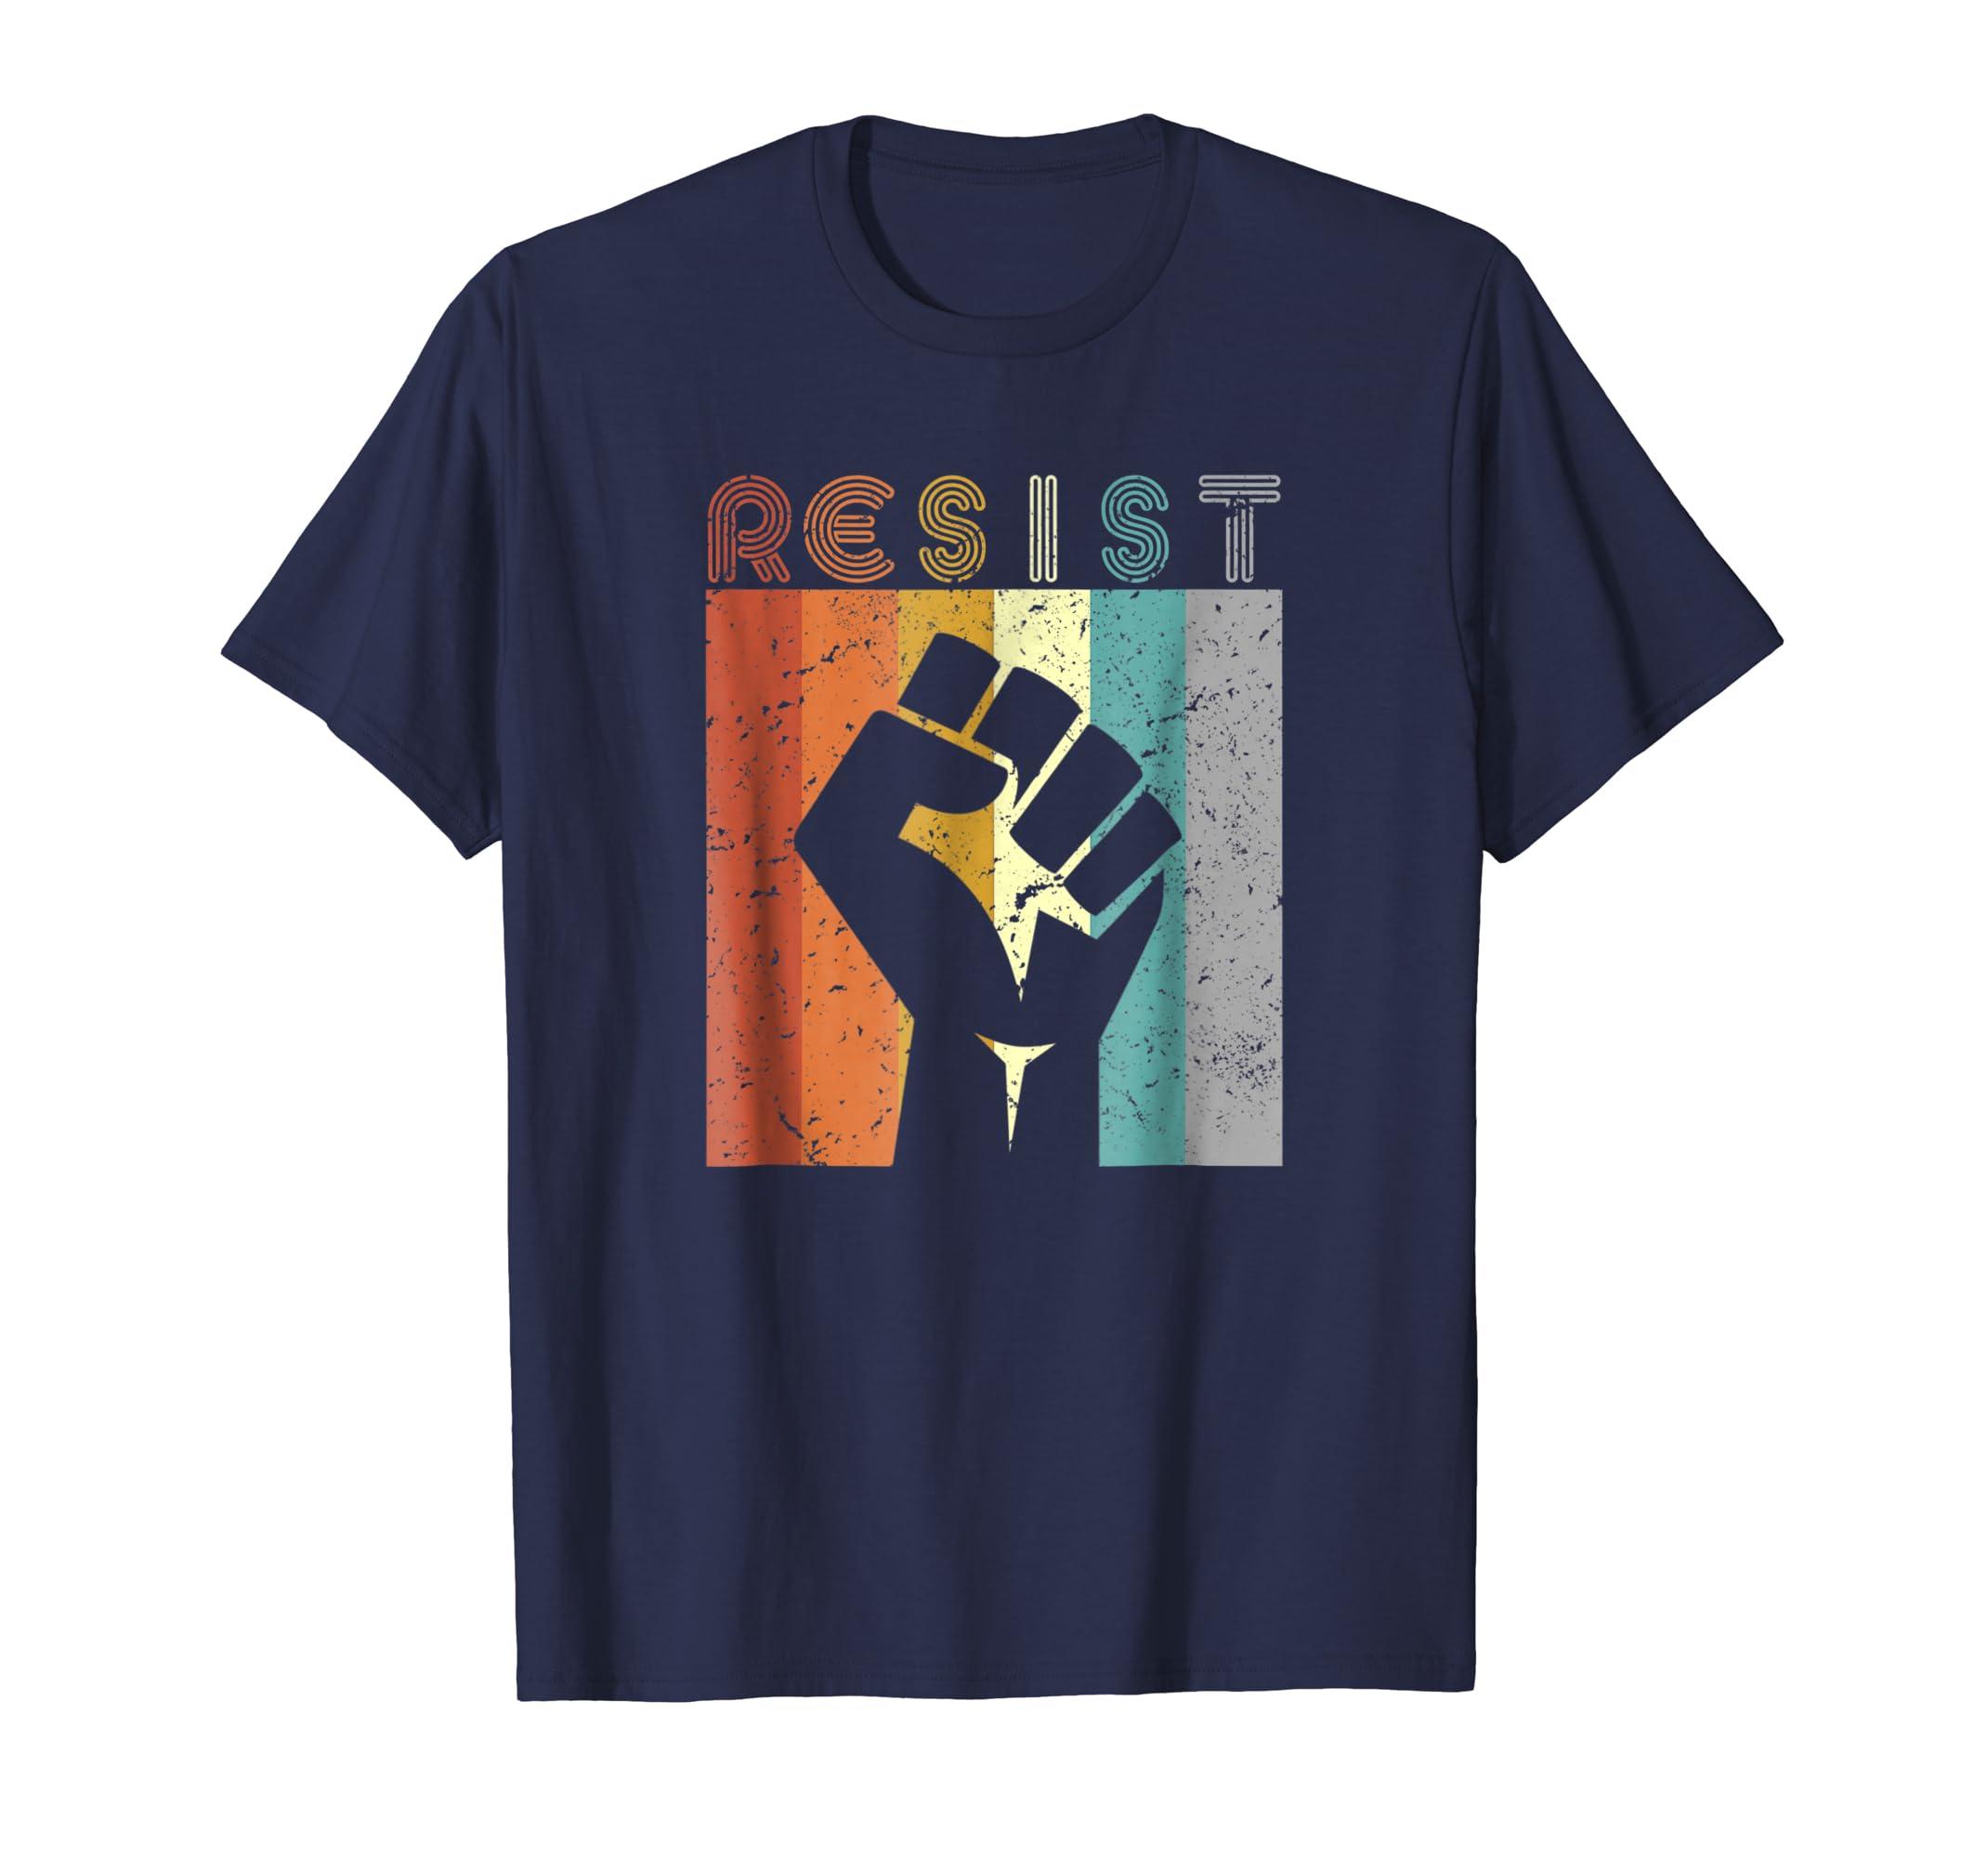 Resist Shirt. Retro, Feminist T Shirt, 70's Vintage Tee-azvn